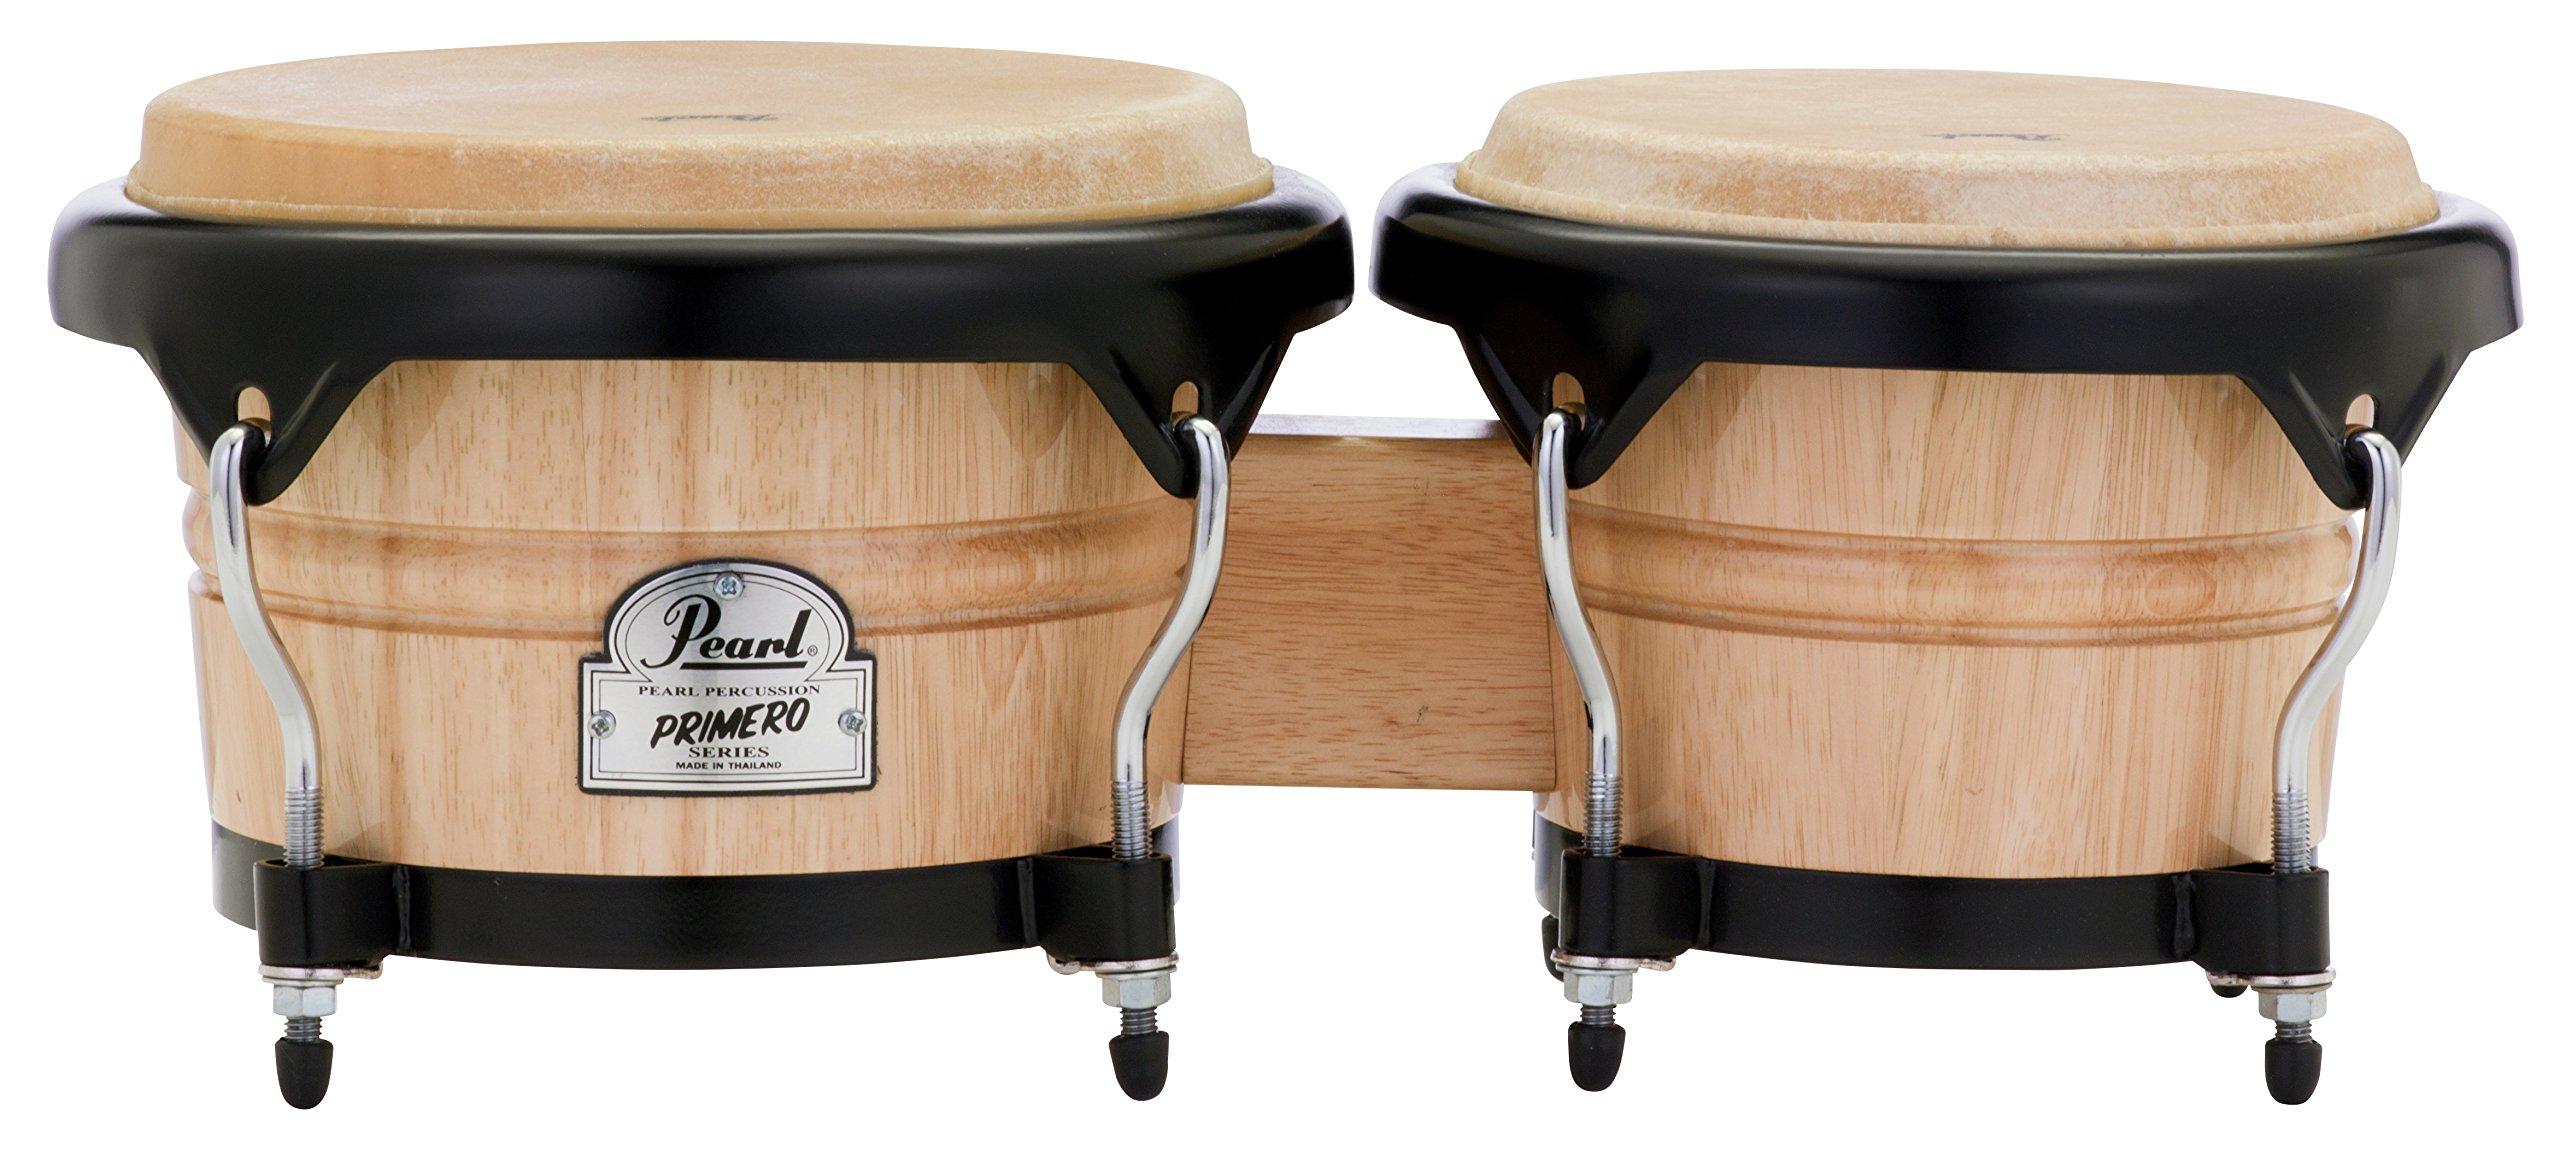 Pearl Primero Series Wood Bongos (PFB102)